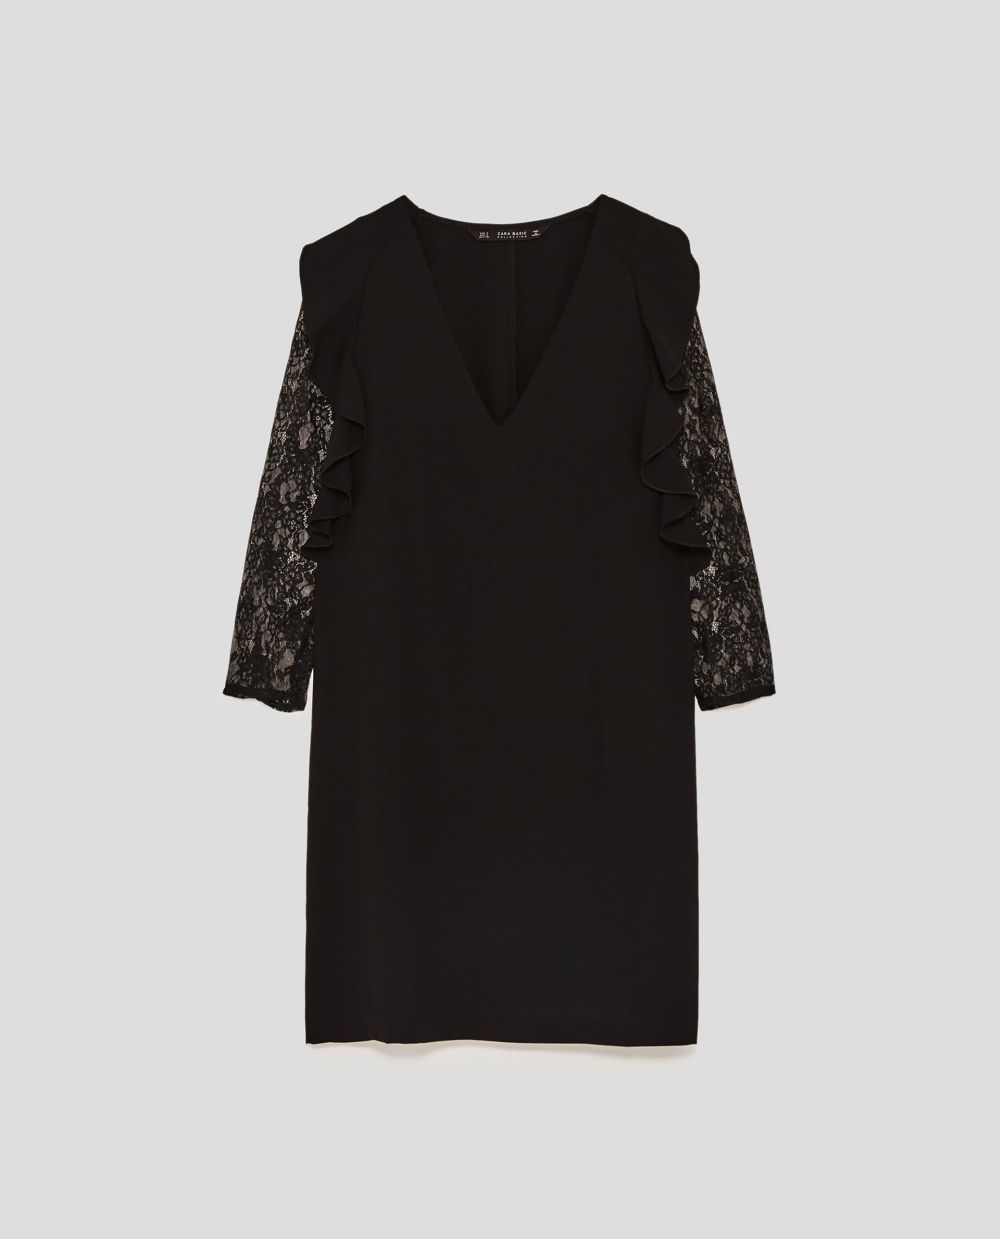 Vestido con mangas de encaje de Zara (29,95 euros)